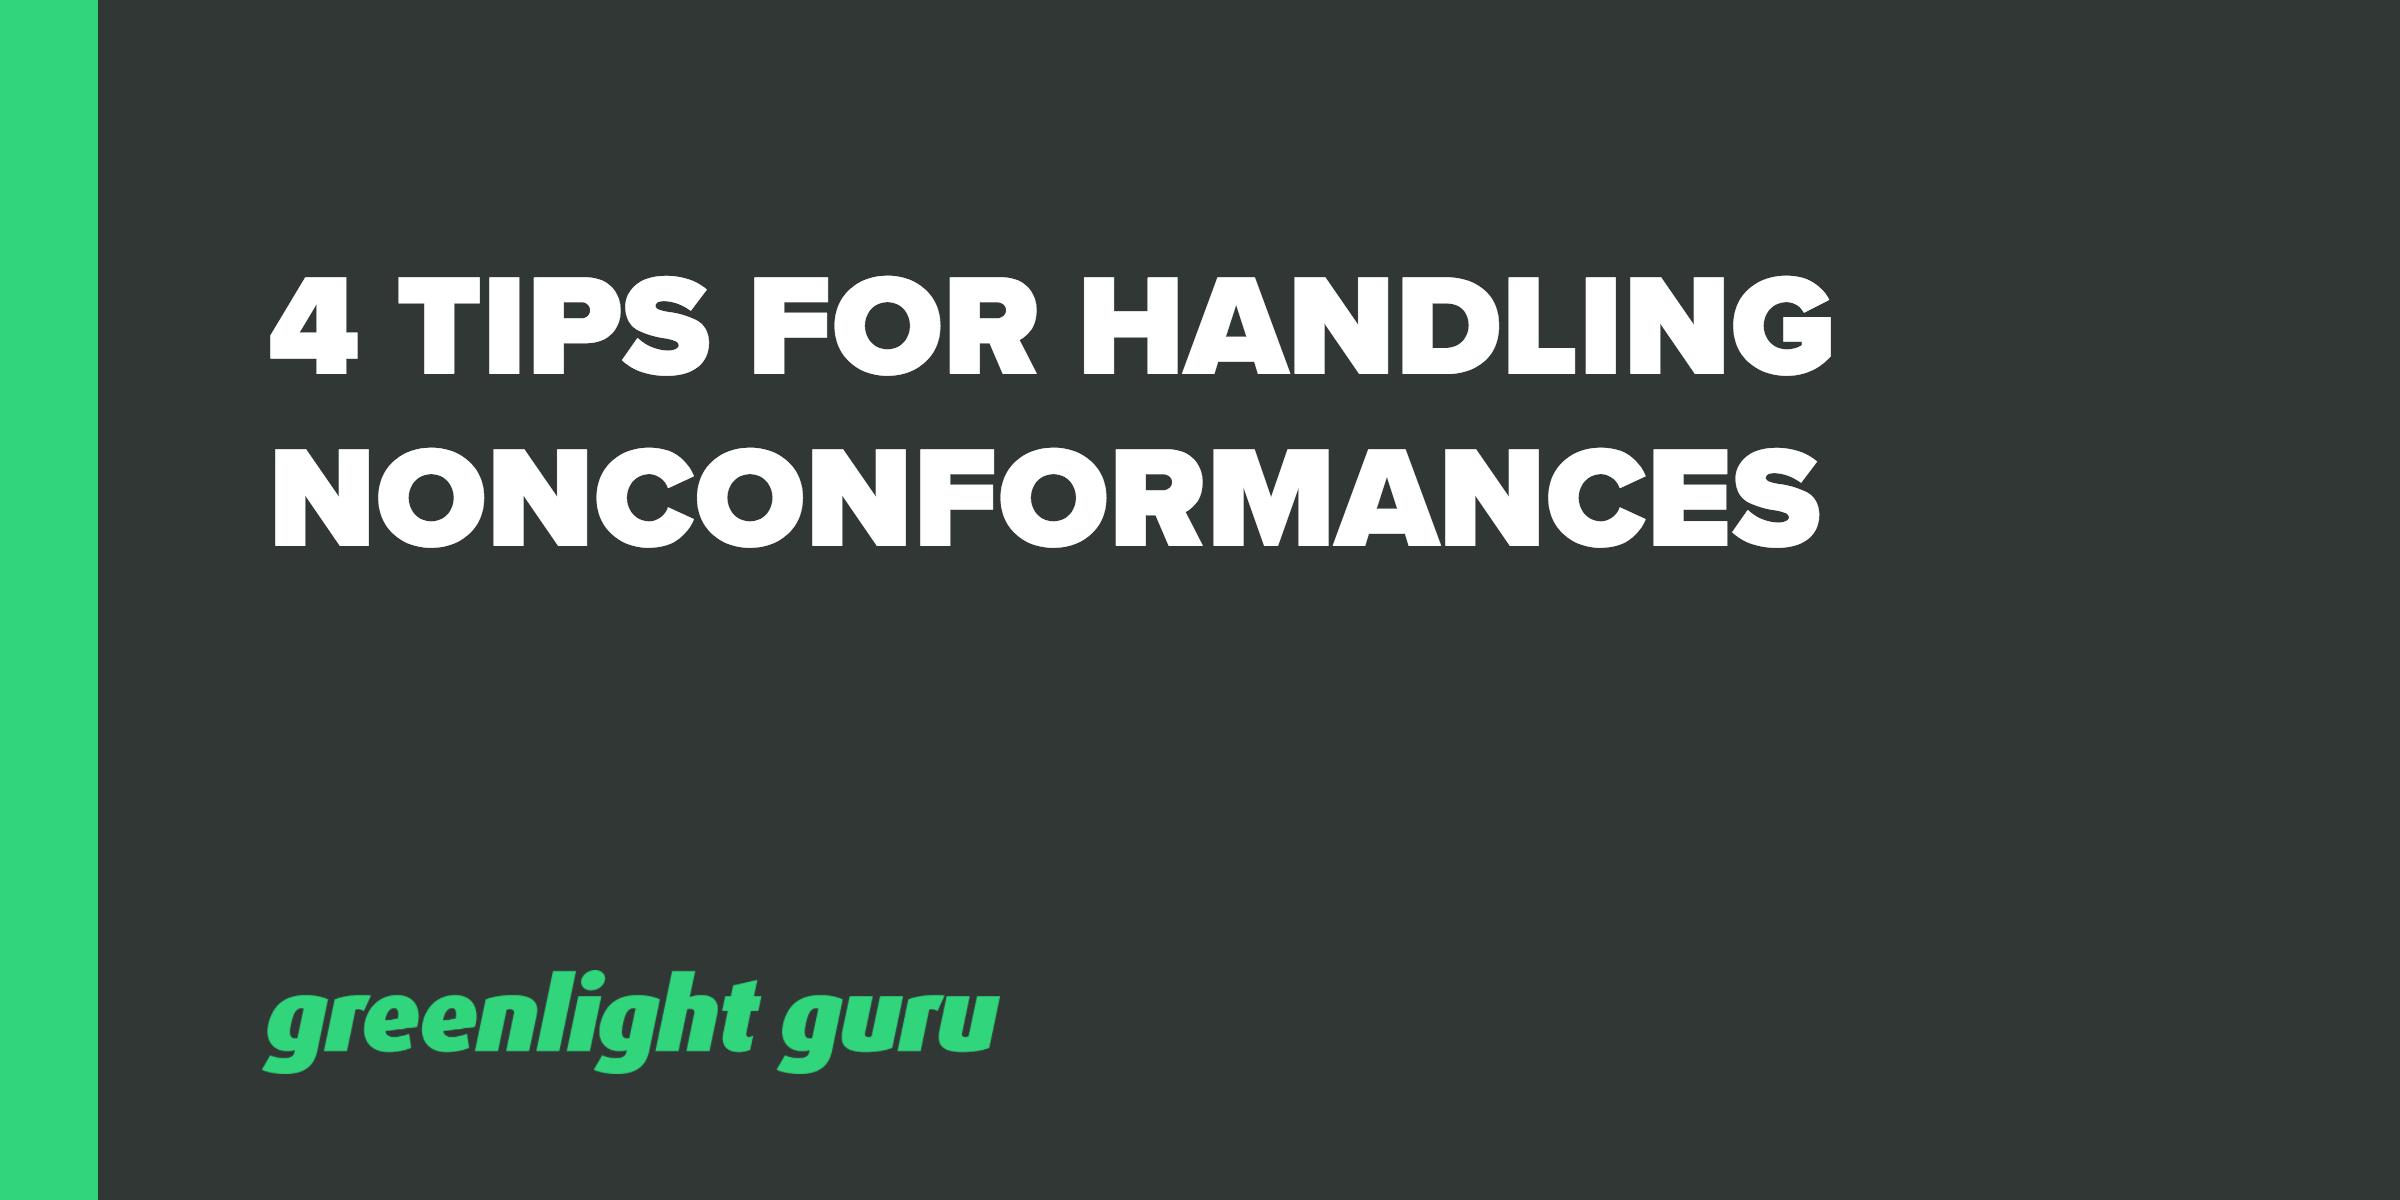 tips-handling-nonconformances